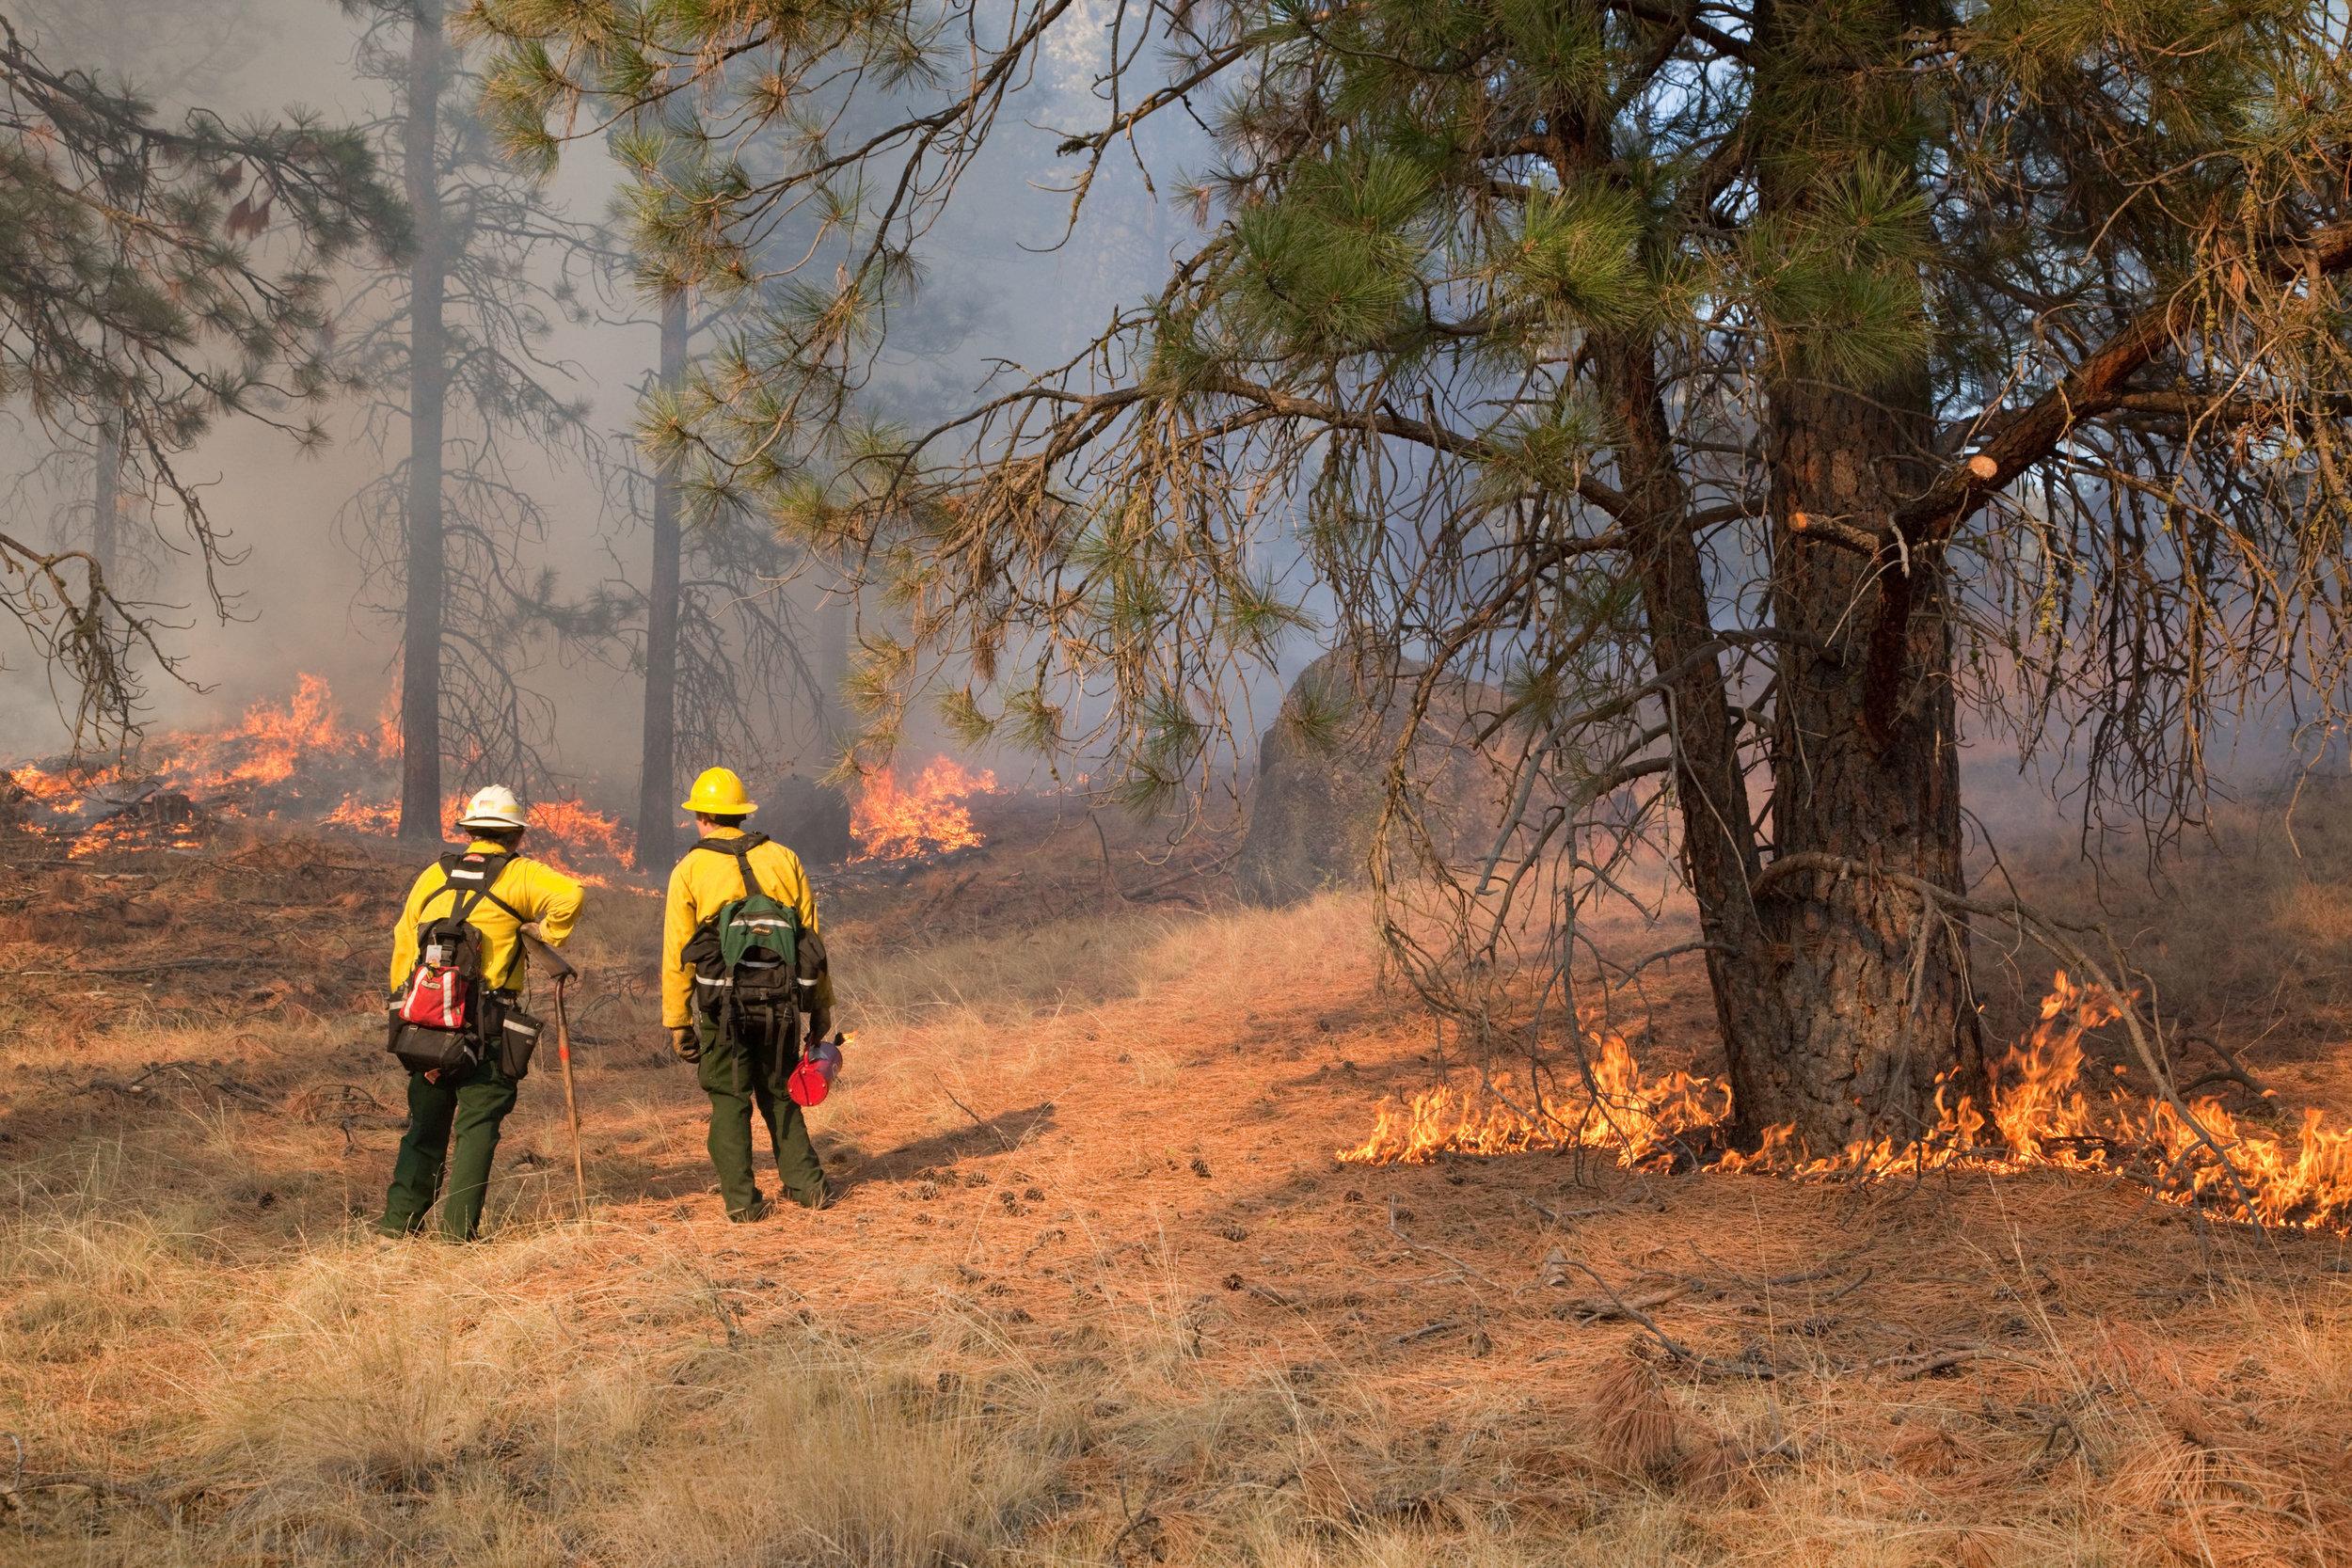 Prescribed fire in ponderosa pine forest in fall on Sinlahekin Wildlife Area in Okanogan County.